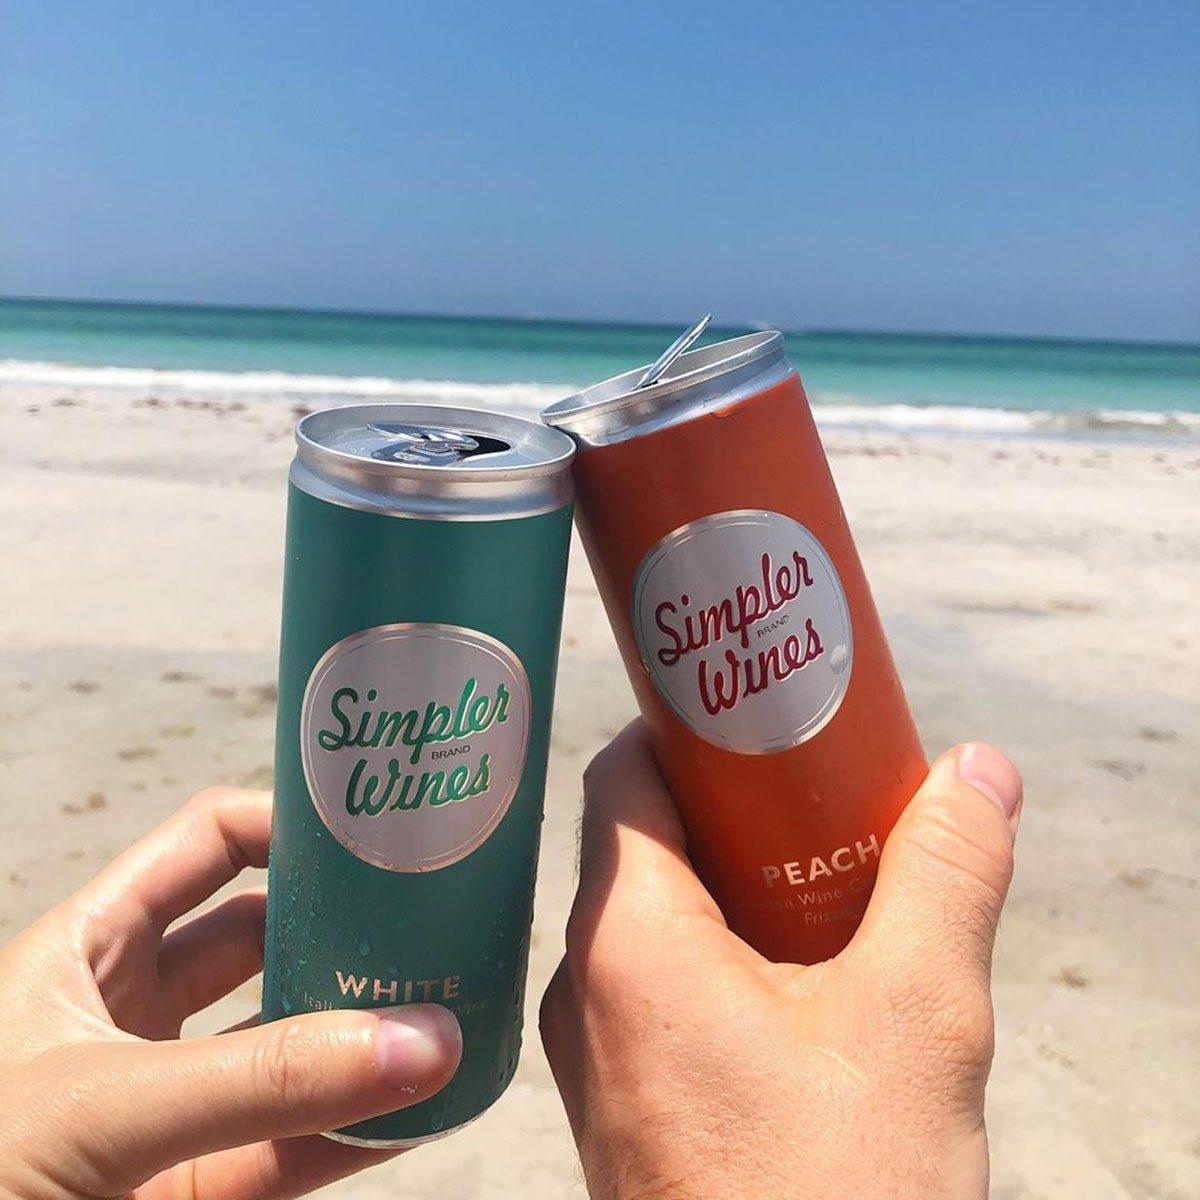 Simpler Wine cans cheersing on beach